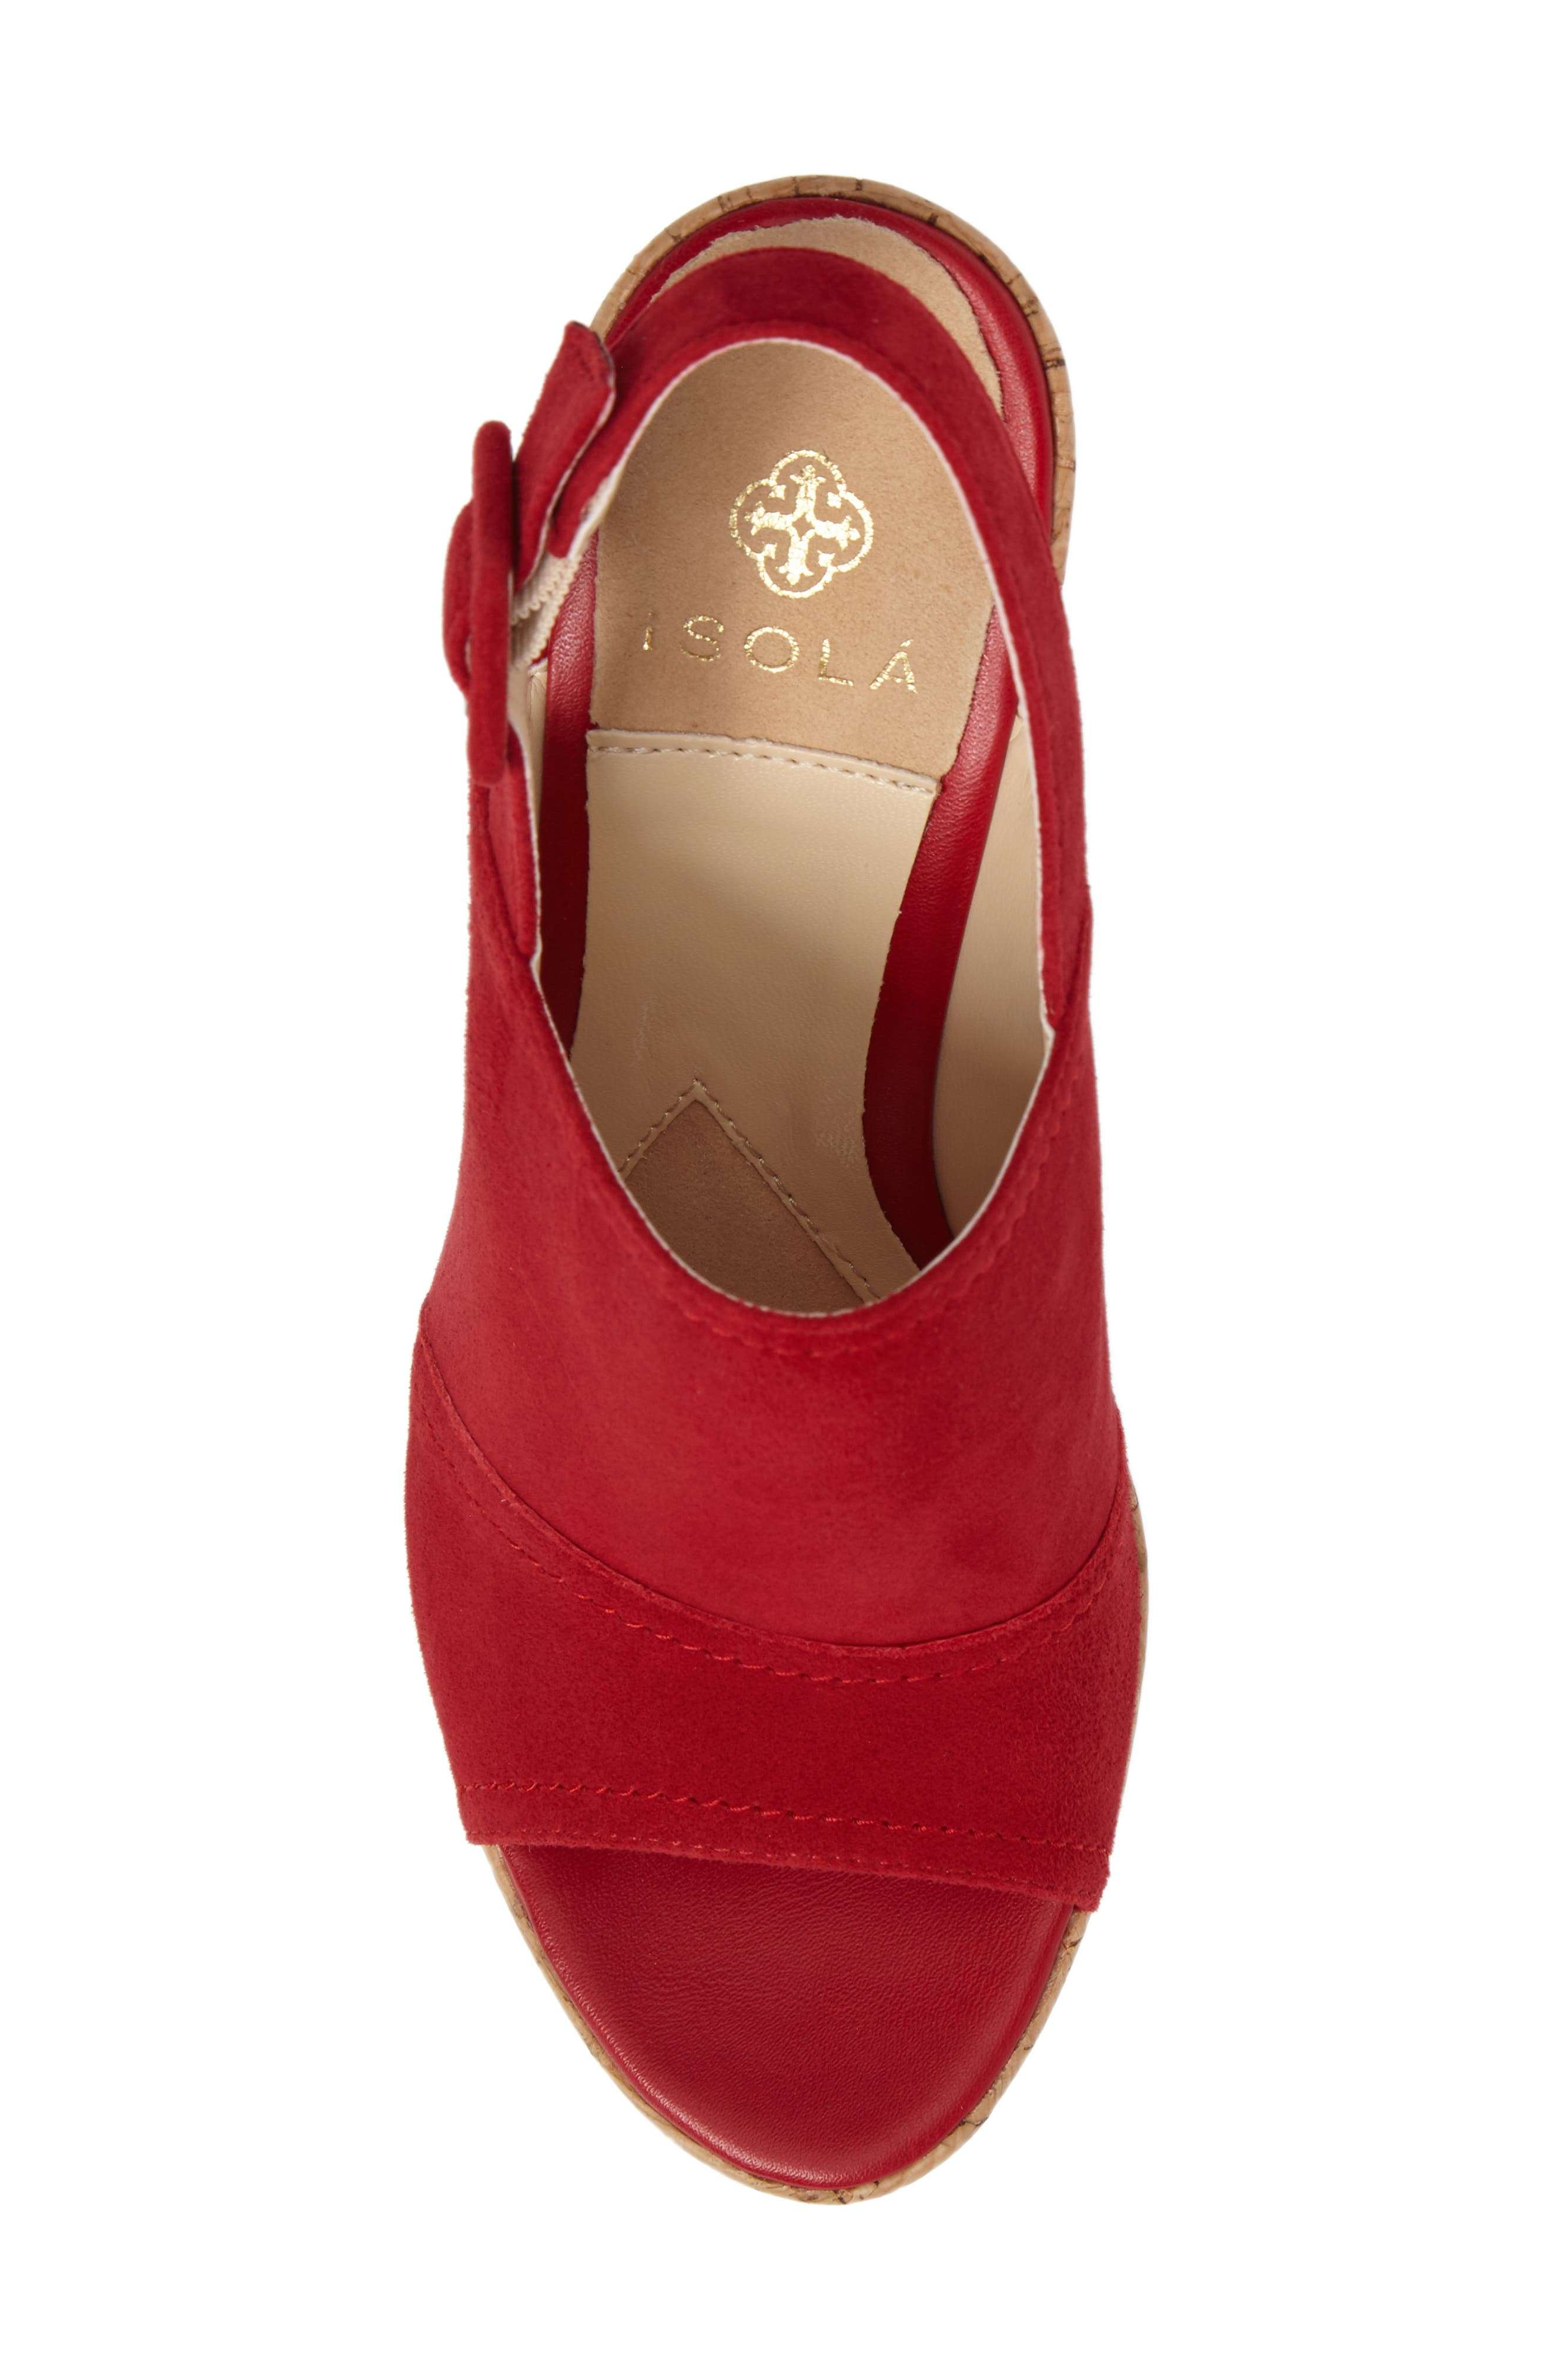 Gabriela Slingback Platform Sandal,                             Alternate thumbnail 5, color,                             FIRE RED SUEDE